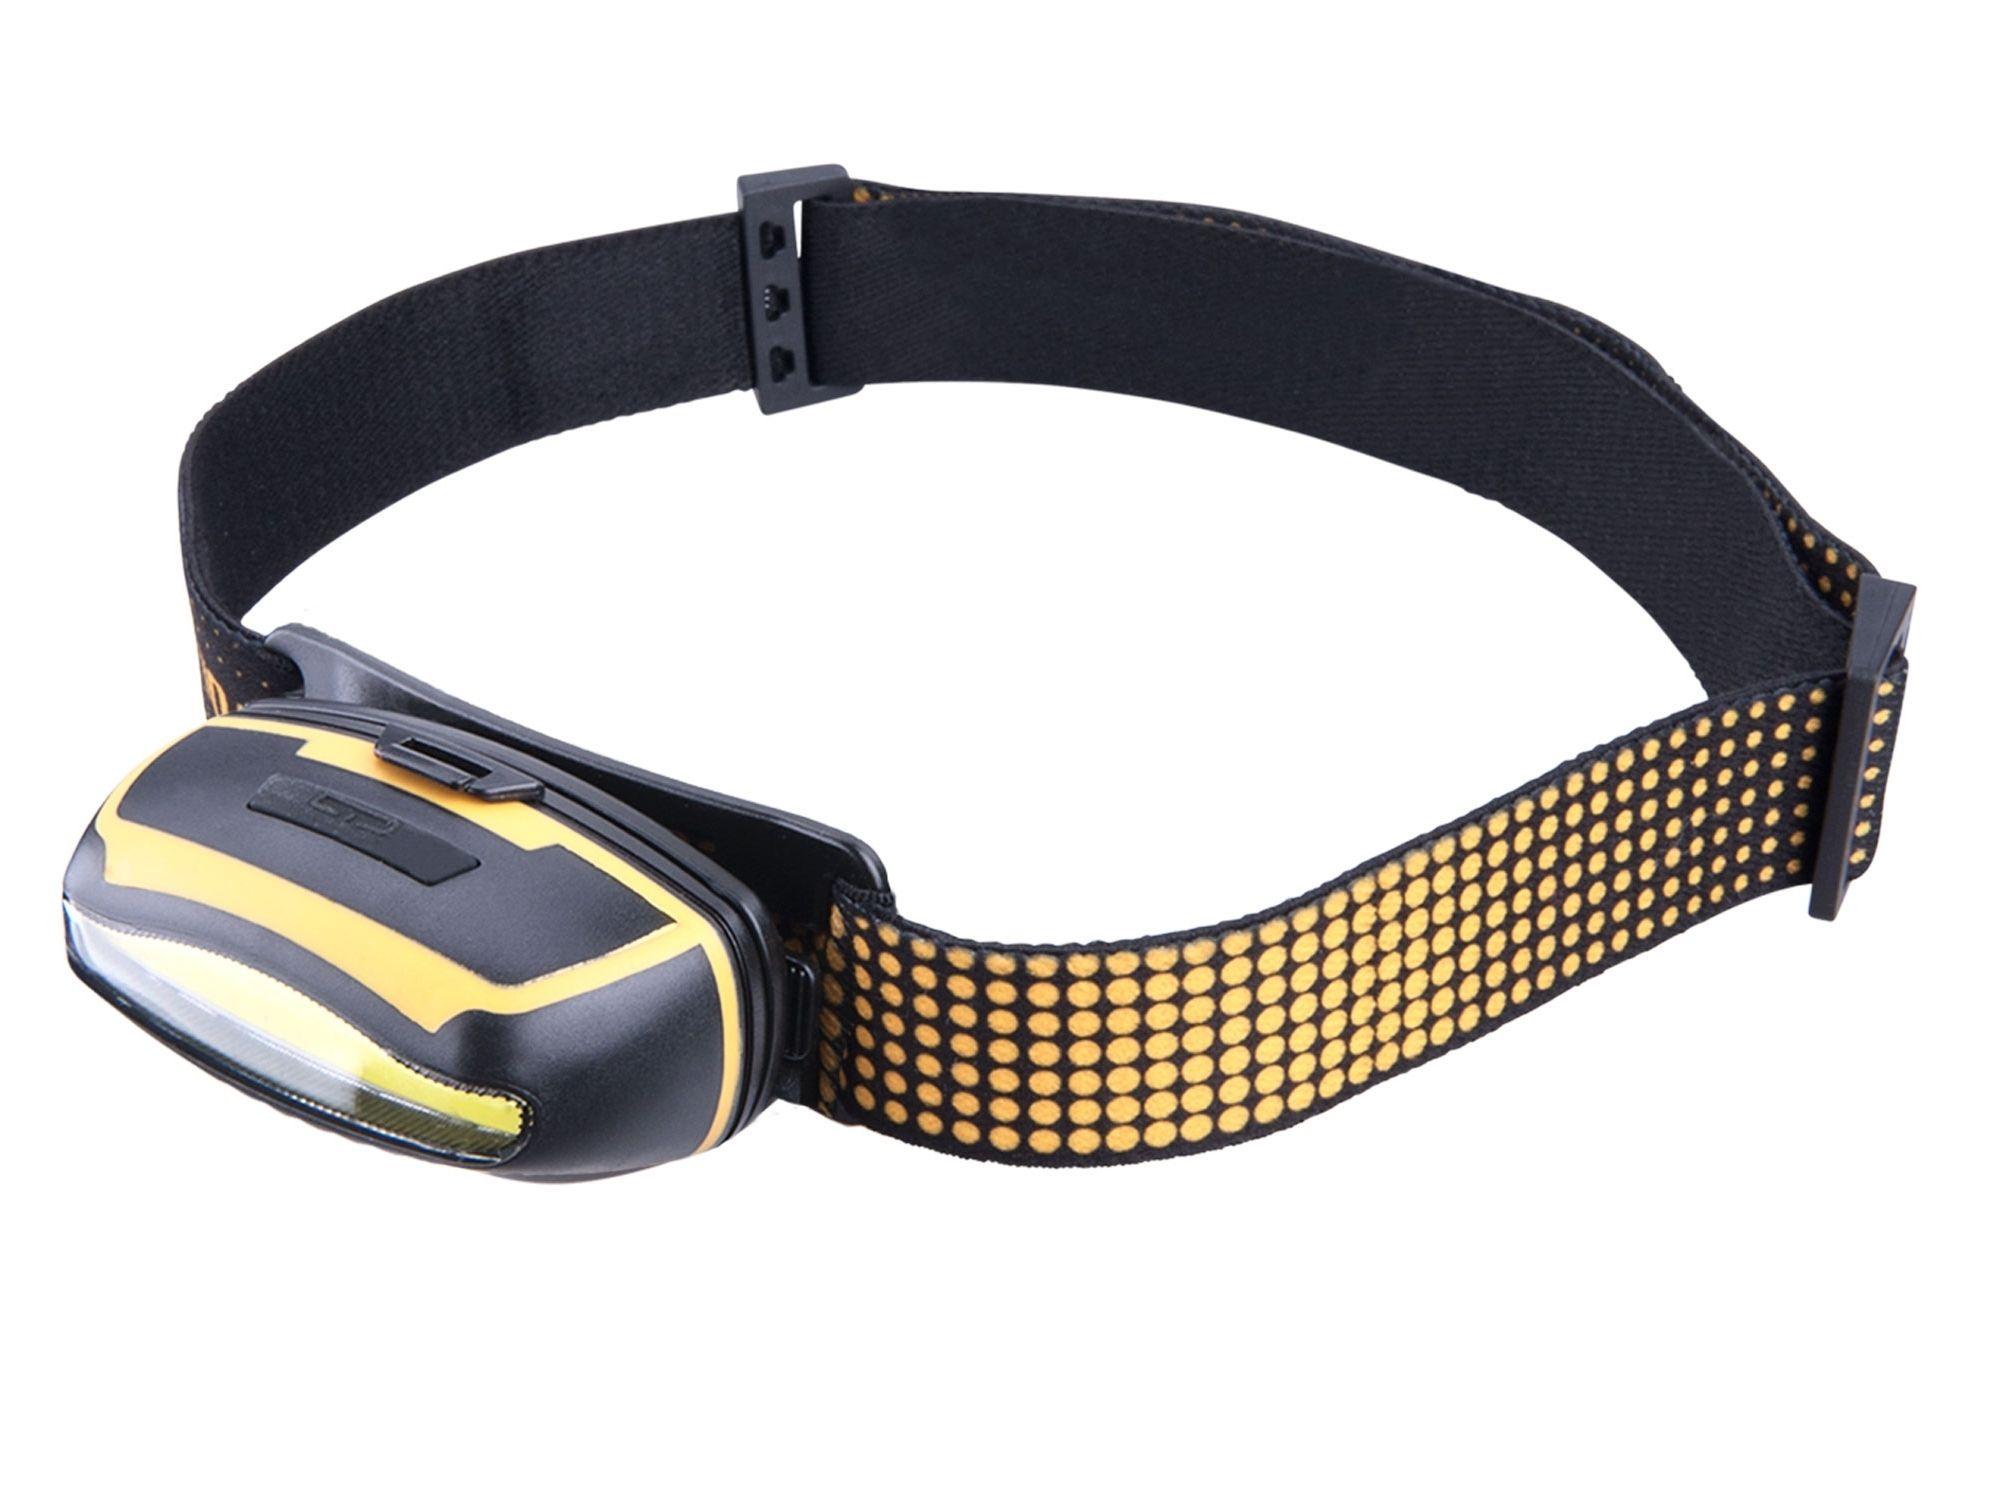 Čelovka širokoúhlá 300lm, 5W COB LED EXTOL-LIGHT 43109